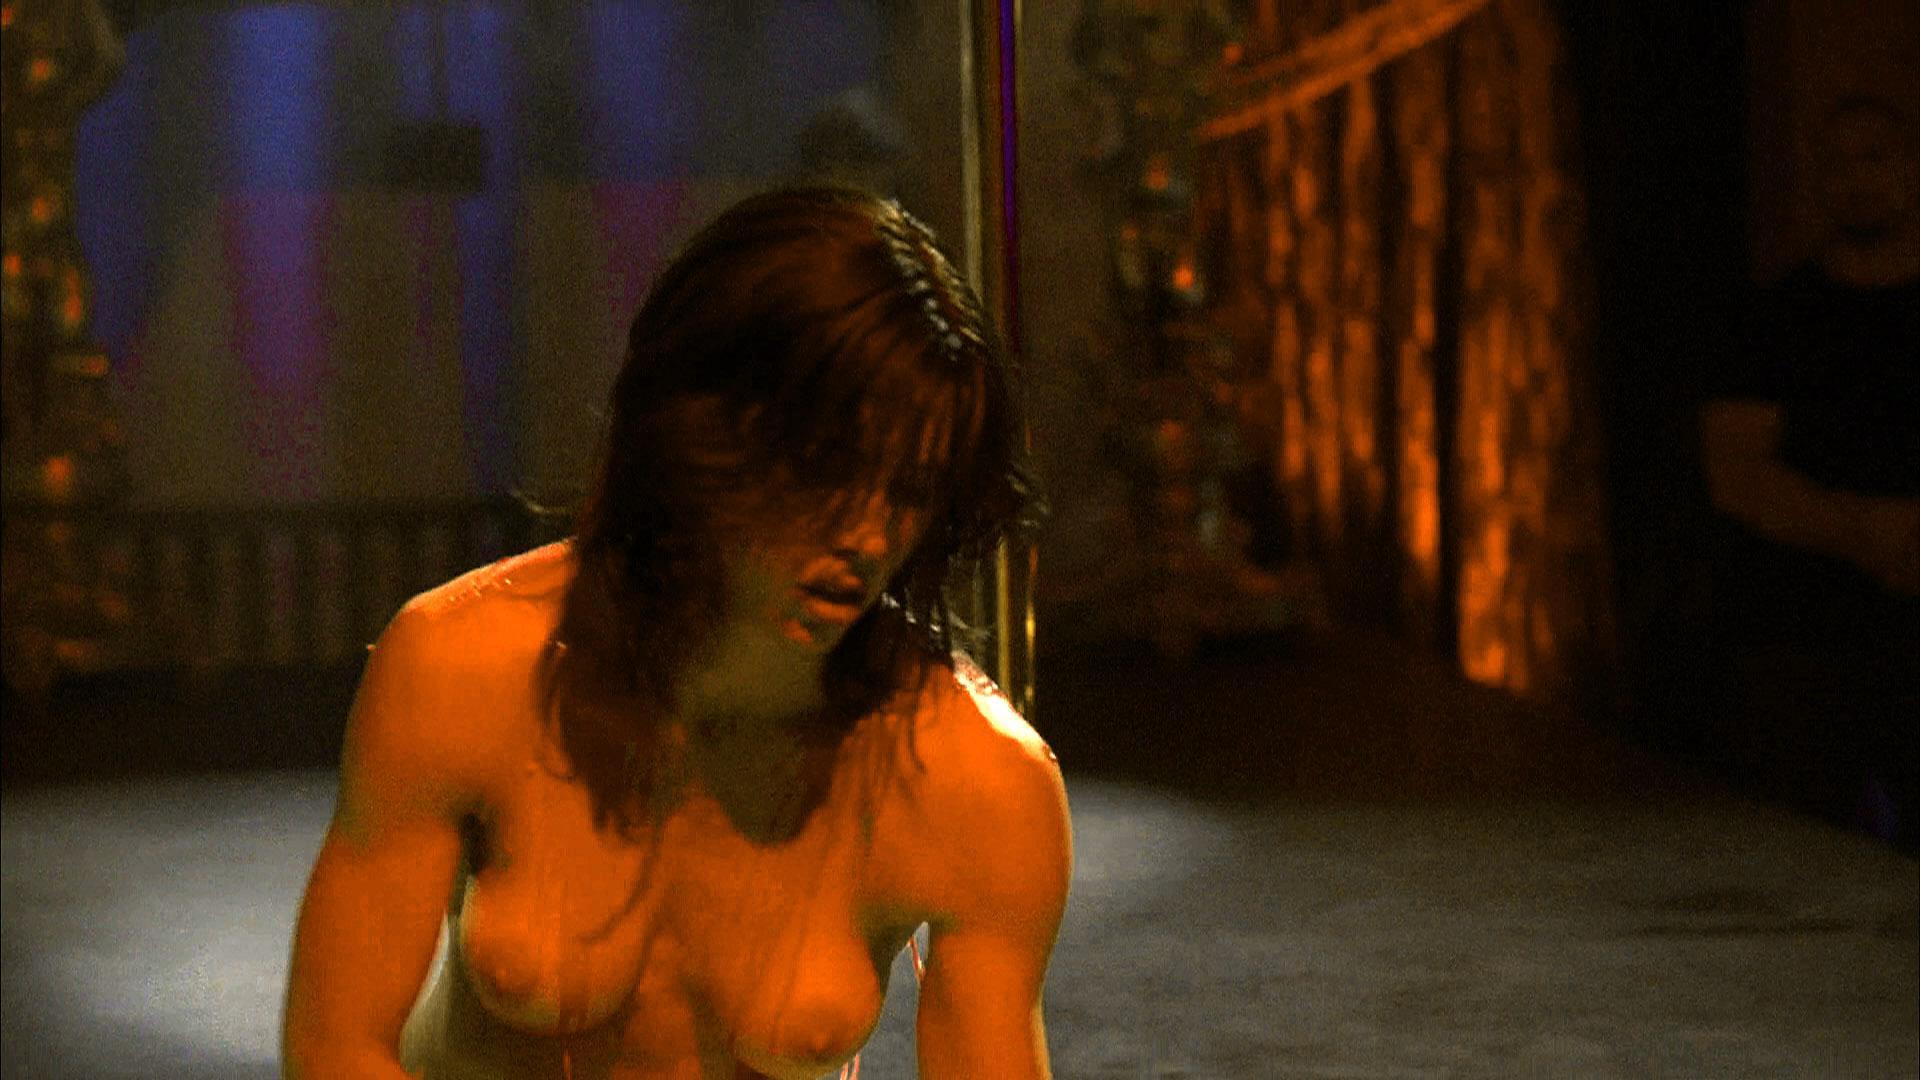 Interesting moment Jessica biel next movie nude consider, that